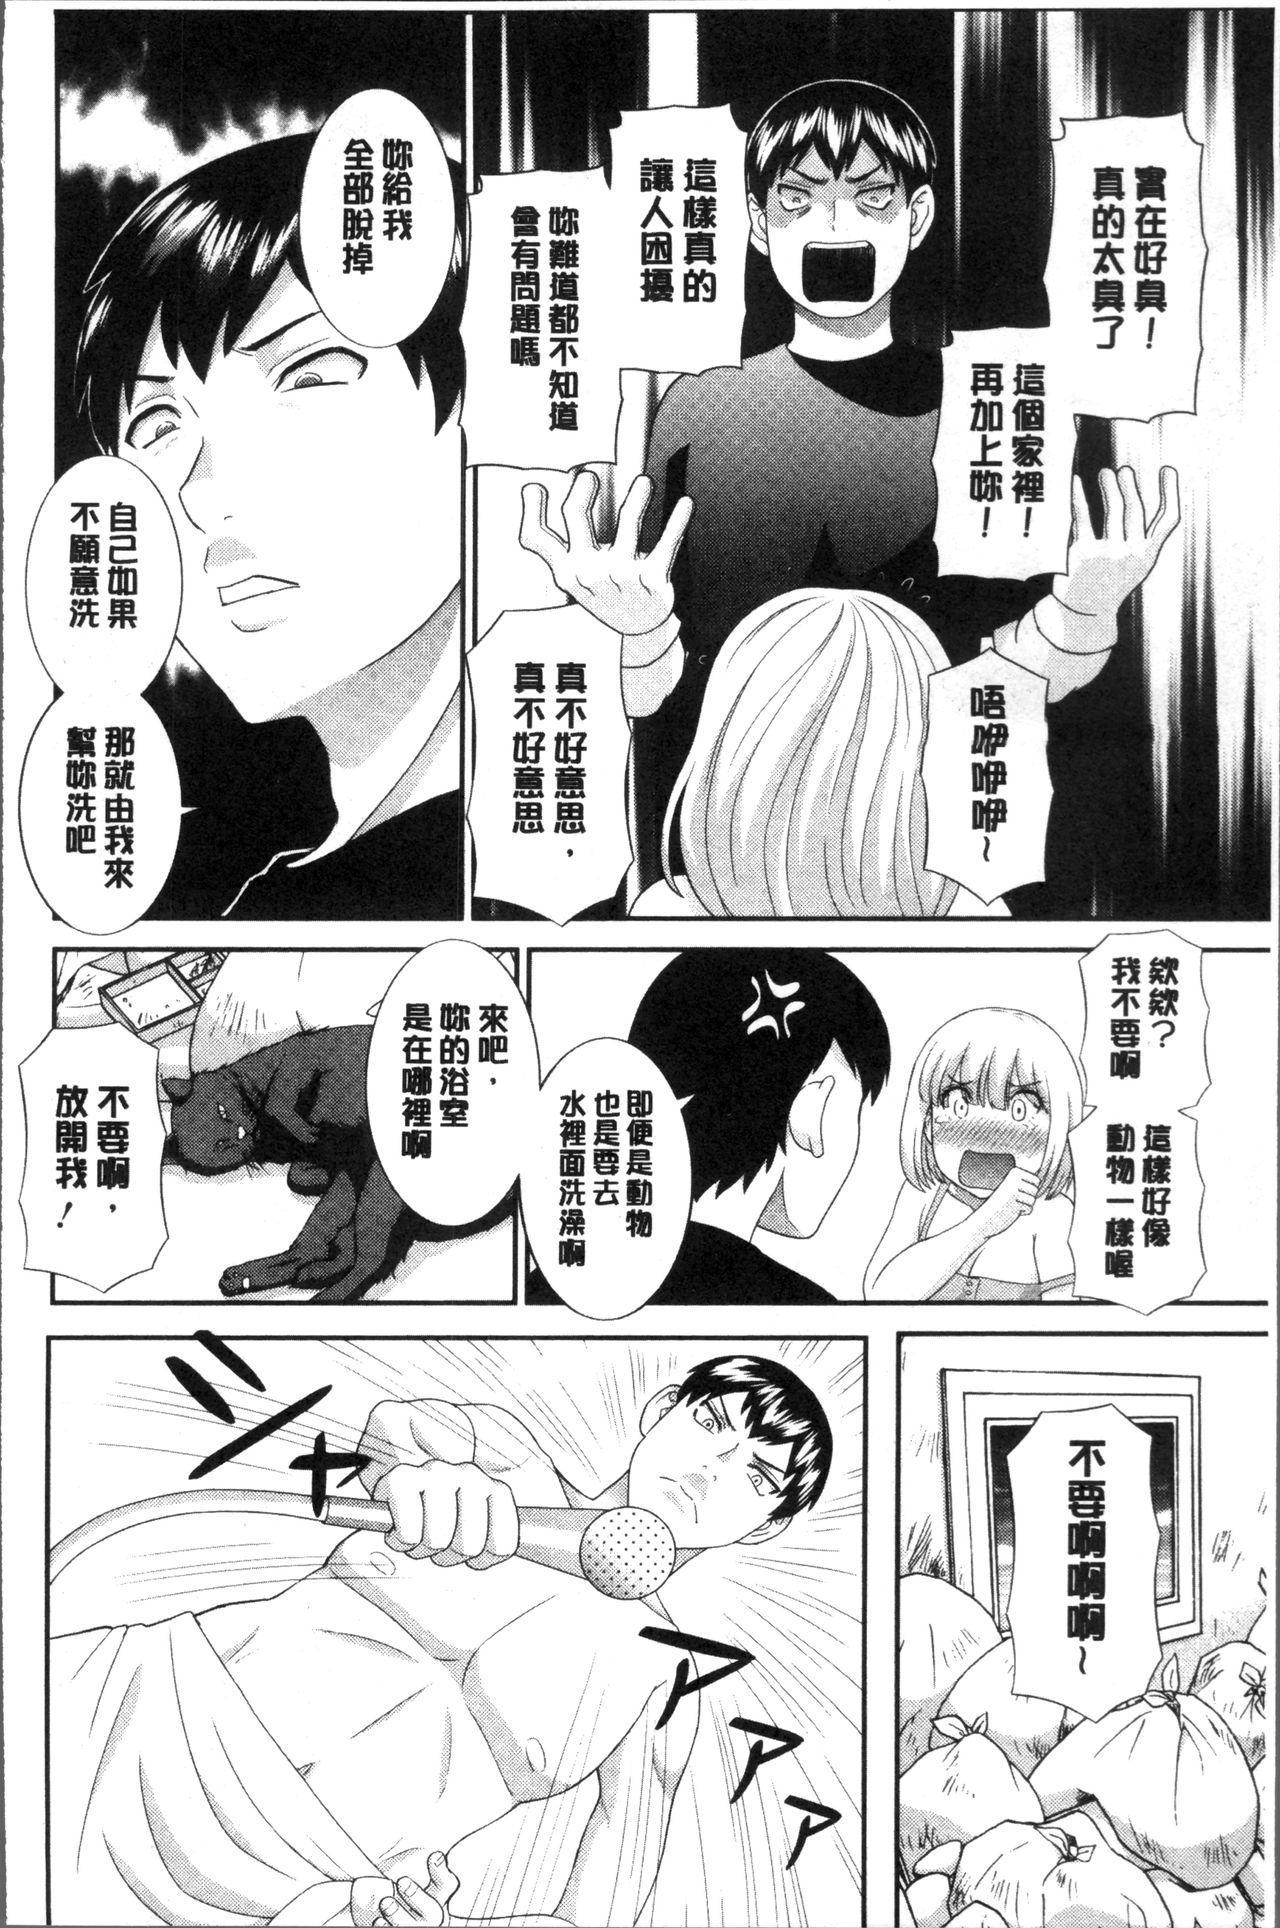 [Kawamori Misaki] Innyuu Shufu no Futei Ganbou - Oku-san to Kanojo to 2 | 淫乳主婦的不貞願望 和人妻也和女友❤2 [Chinese] 49